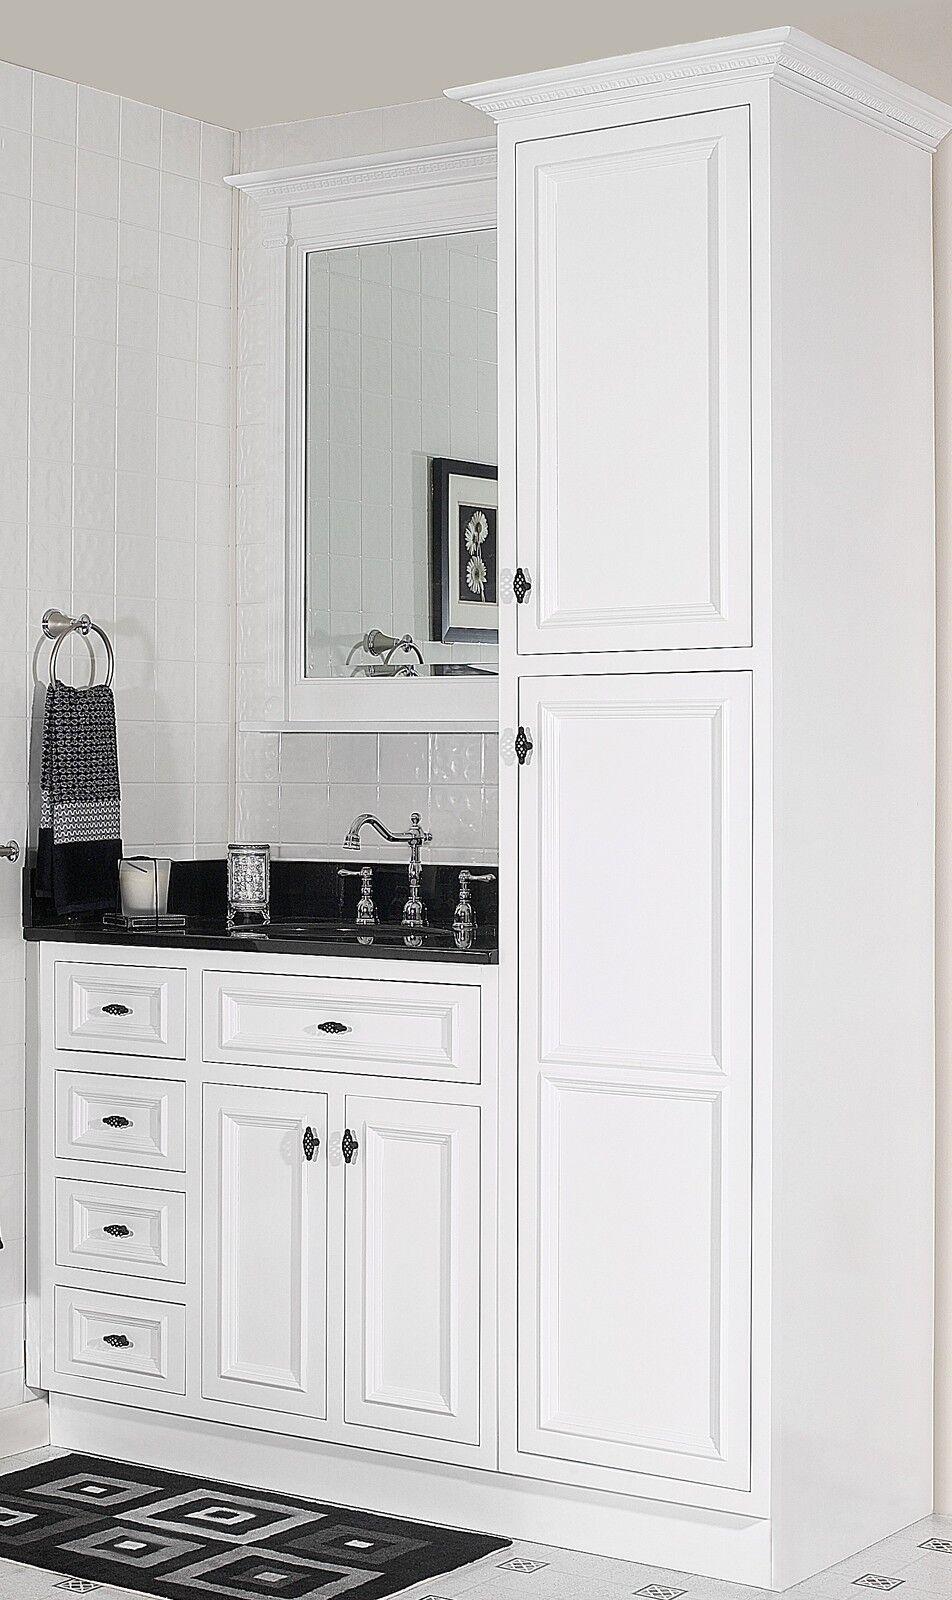 Excellent Bathroomvanityandcabinetsetbathroomlinencabinetstunningvanity